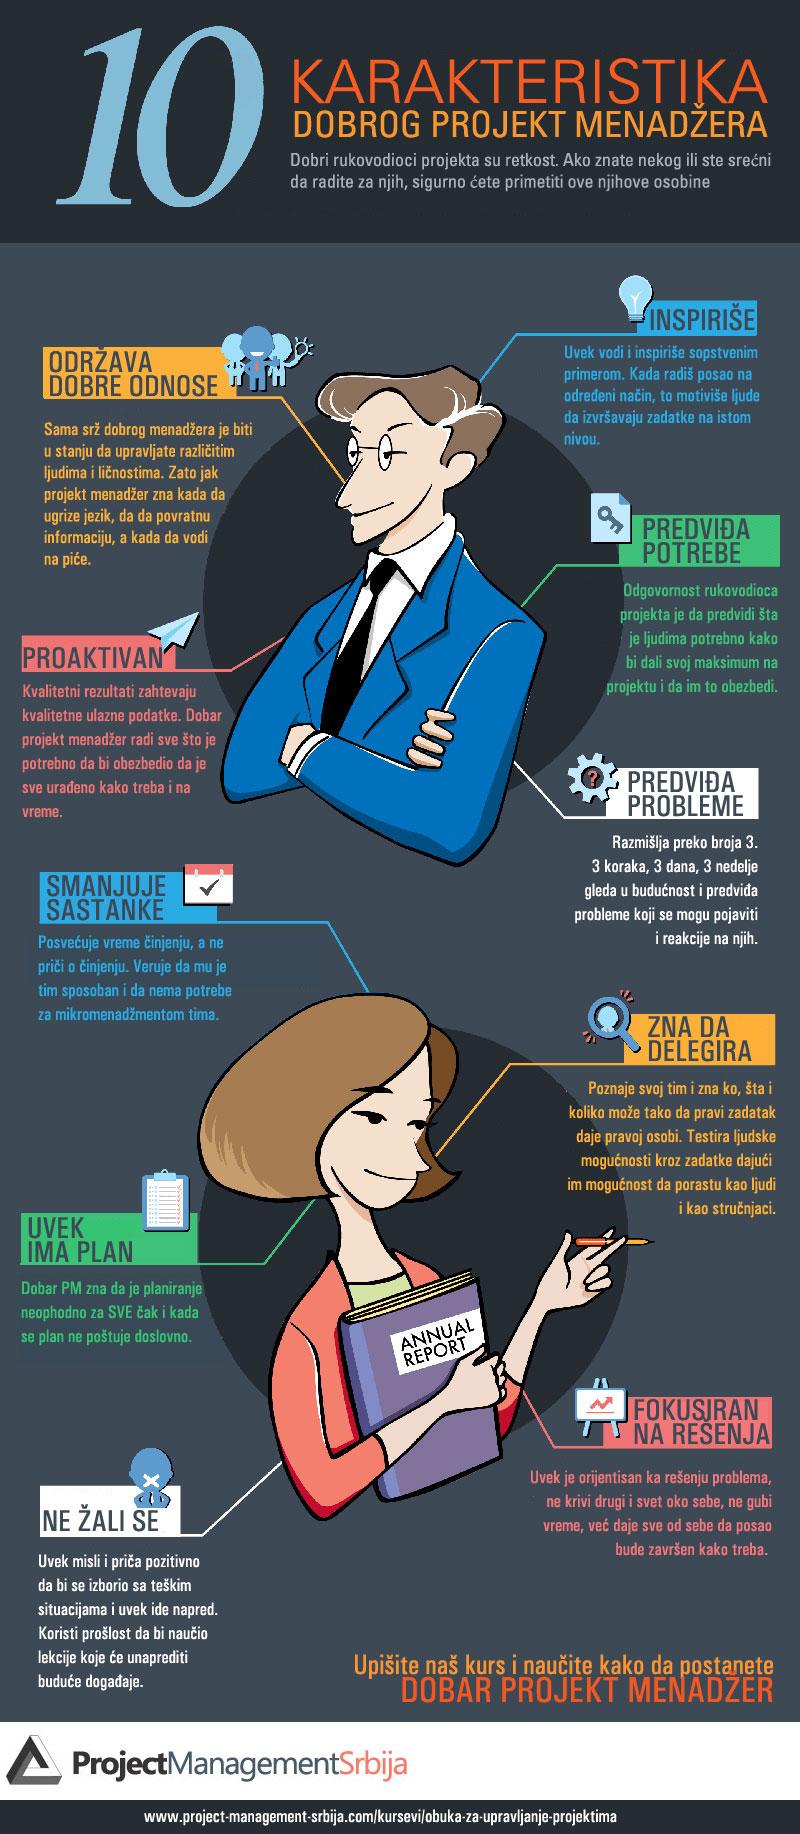 10-karakteristika-dobrog-projekt-menadzera